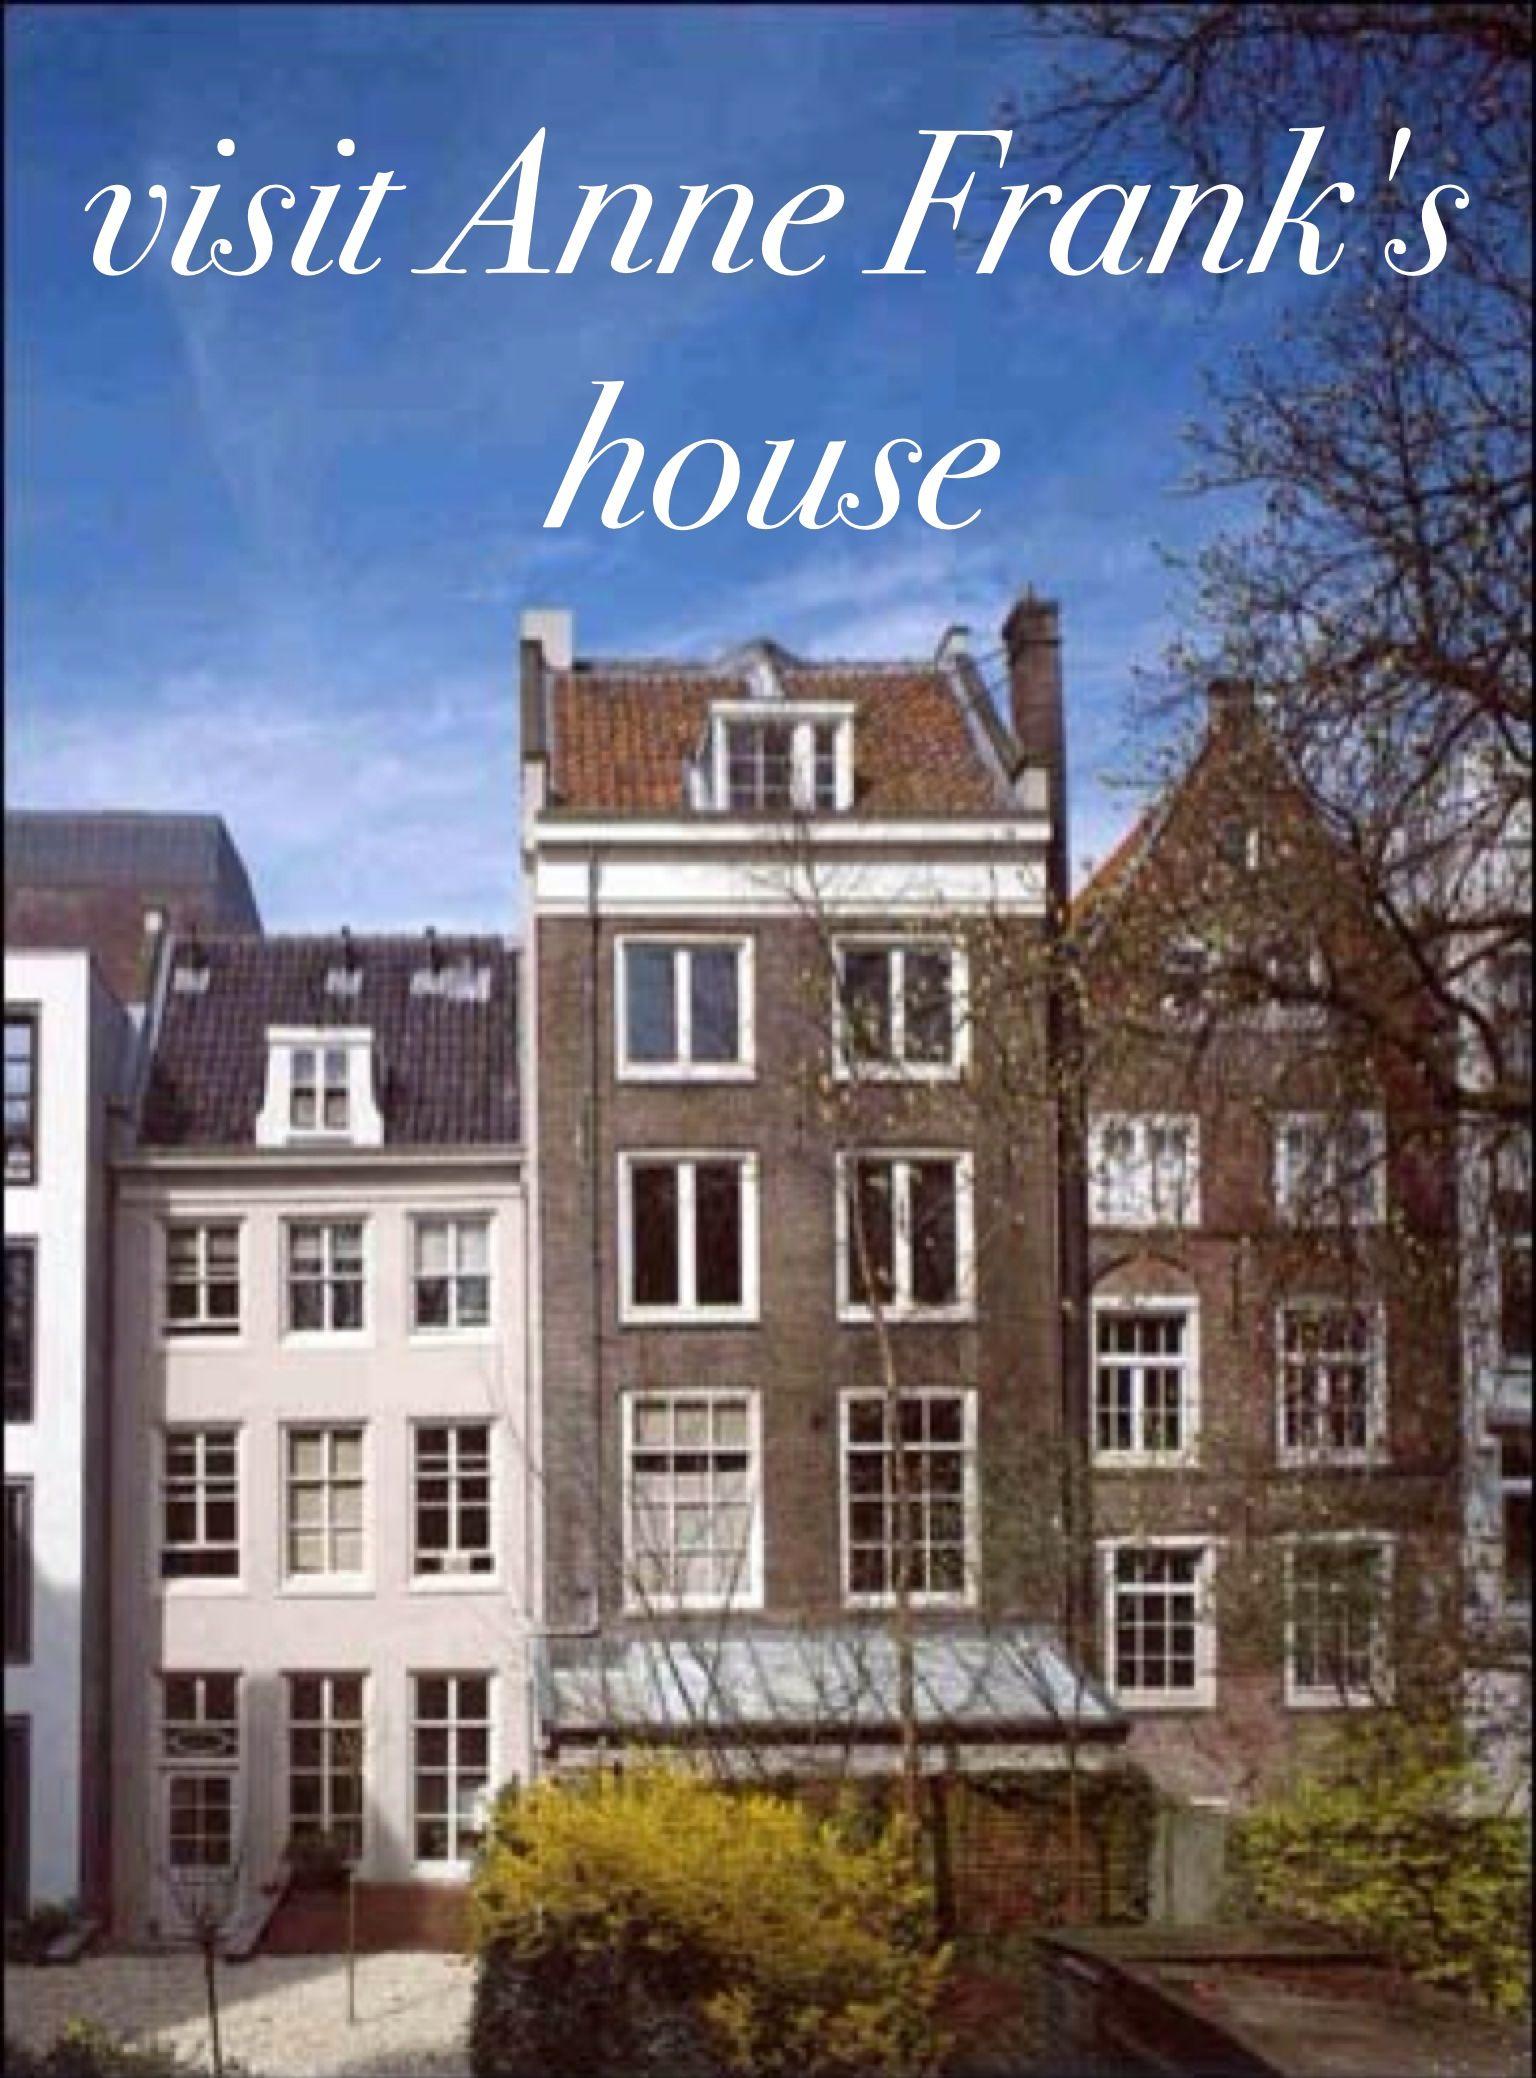 Anne frank huis amsterdam online dating